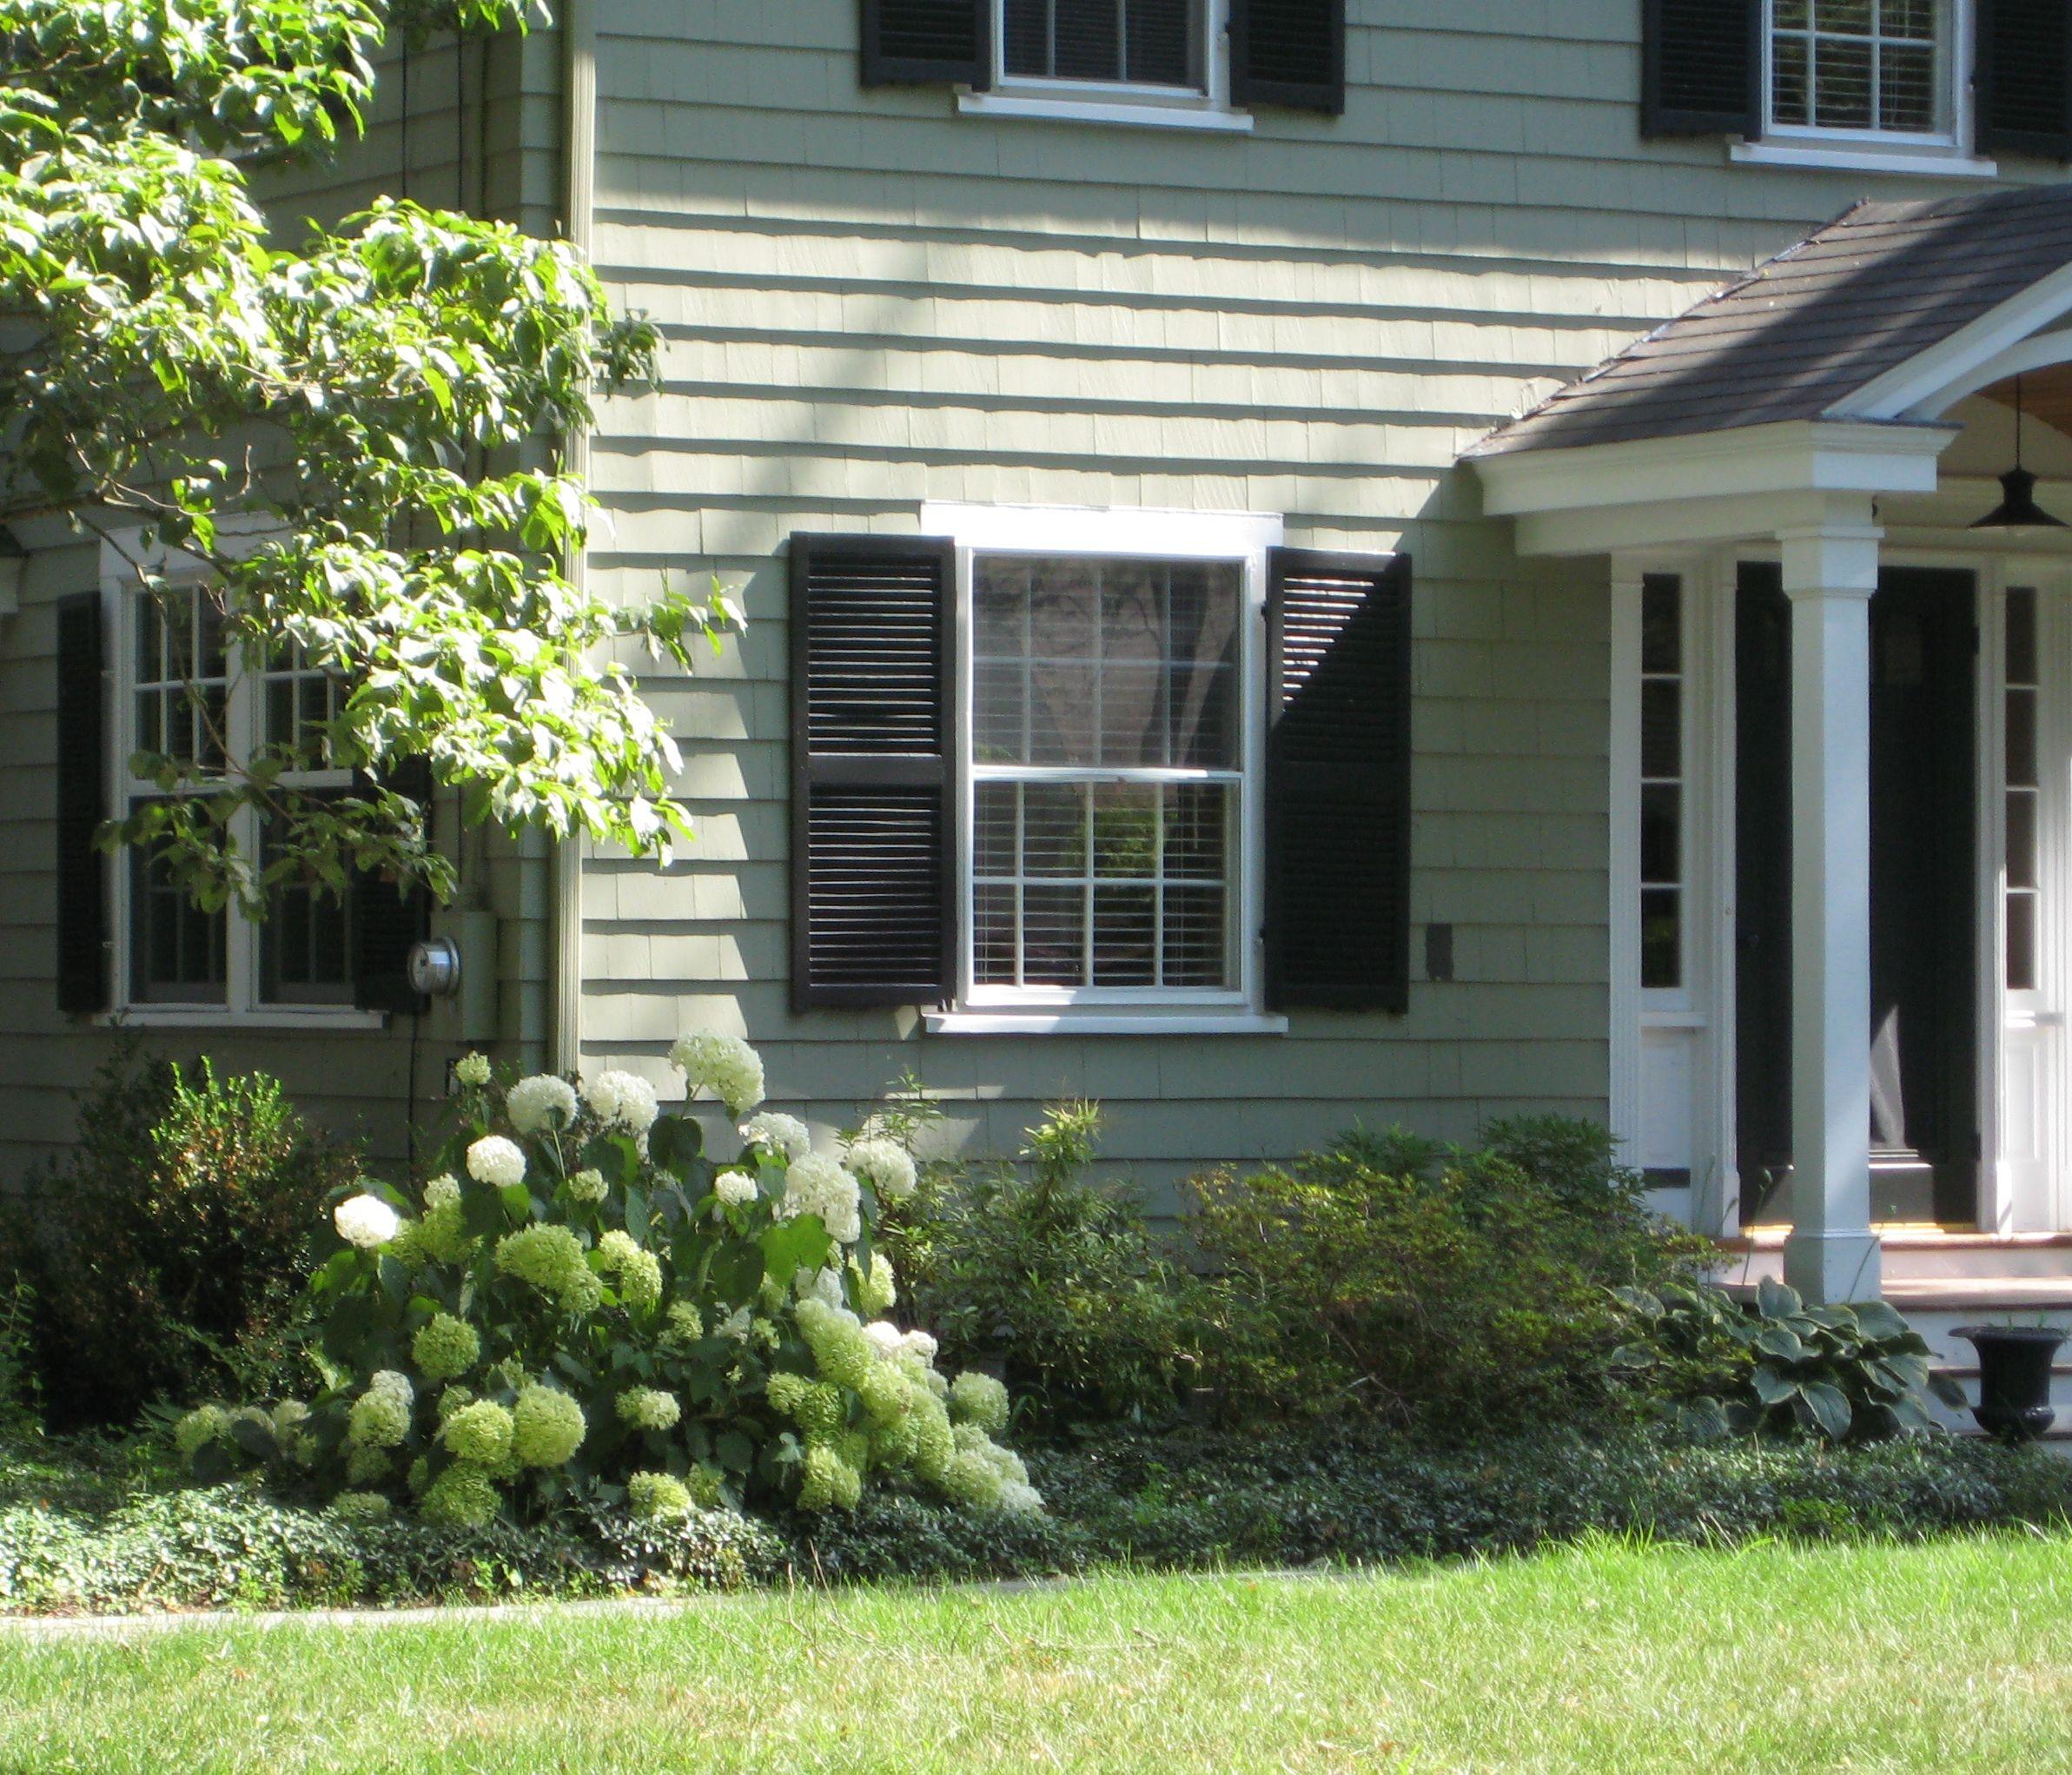 shuttered windows, pale green house, large blooms/leaves hostas ...